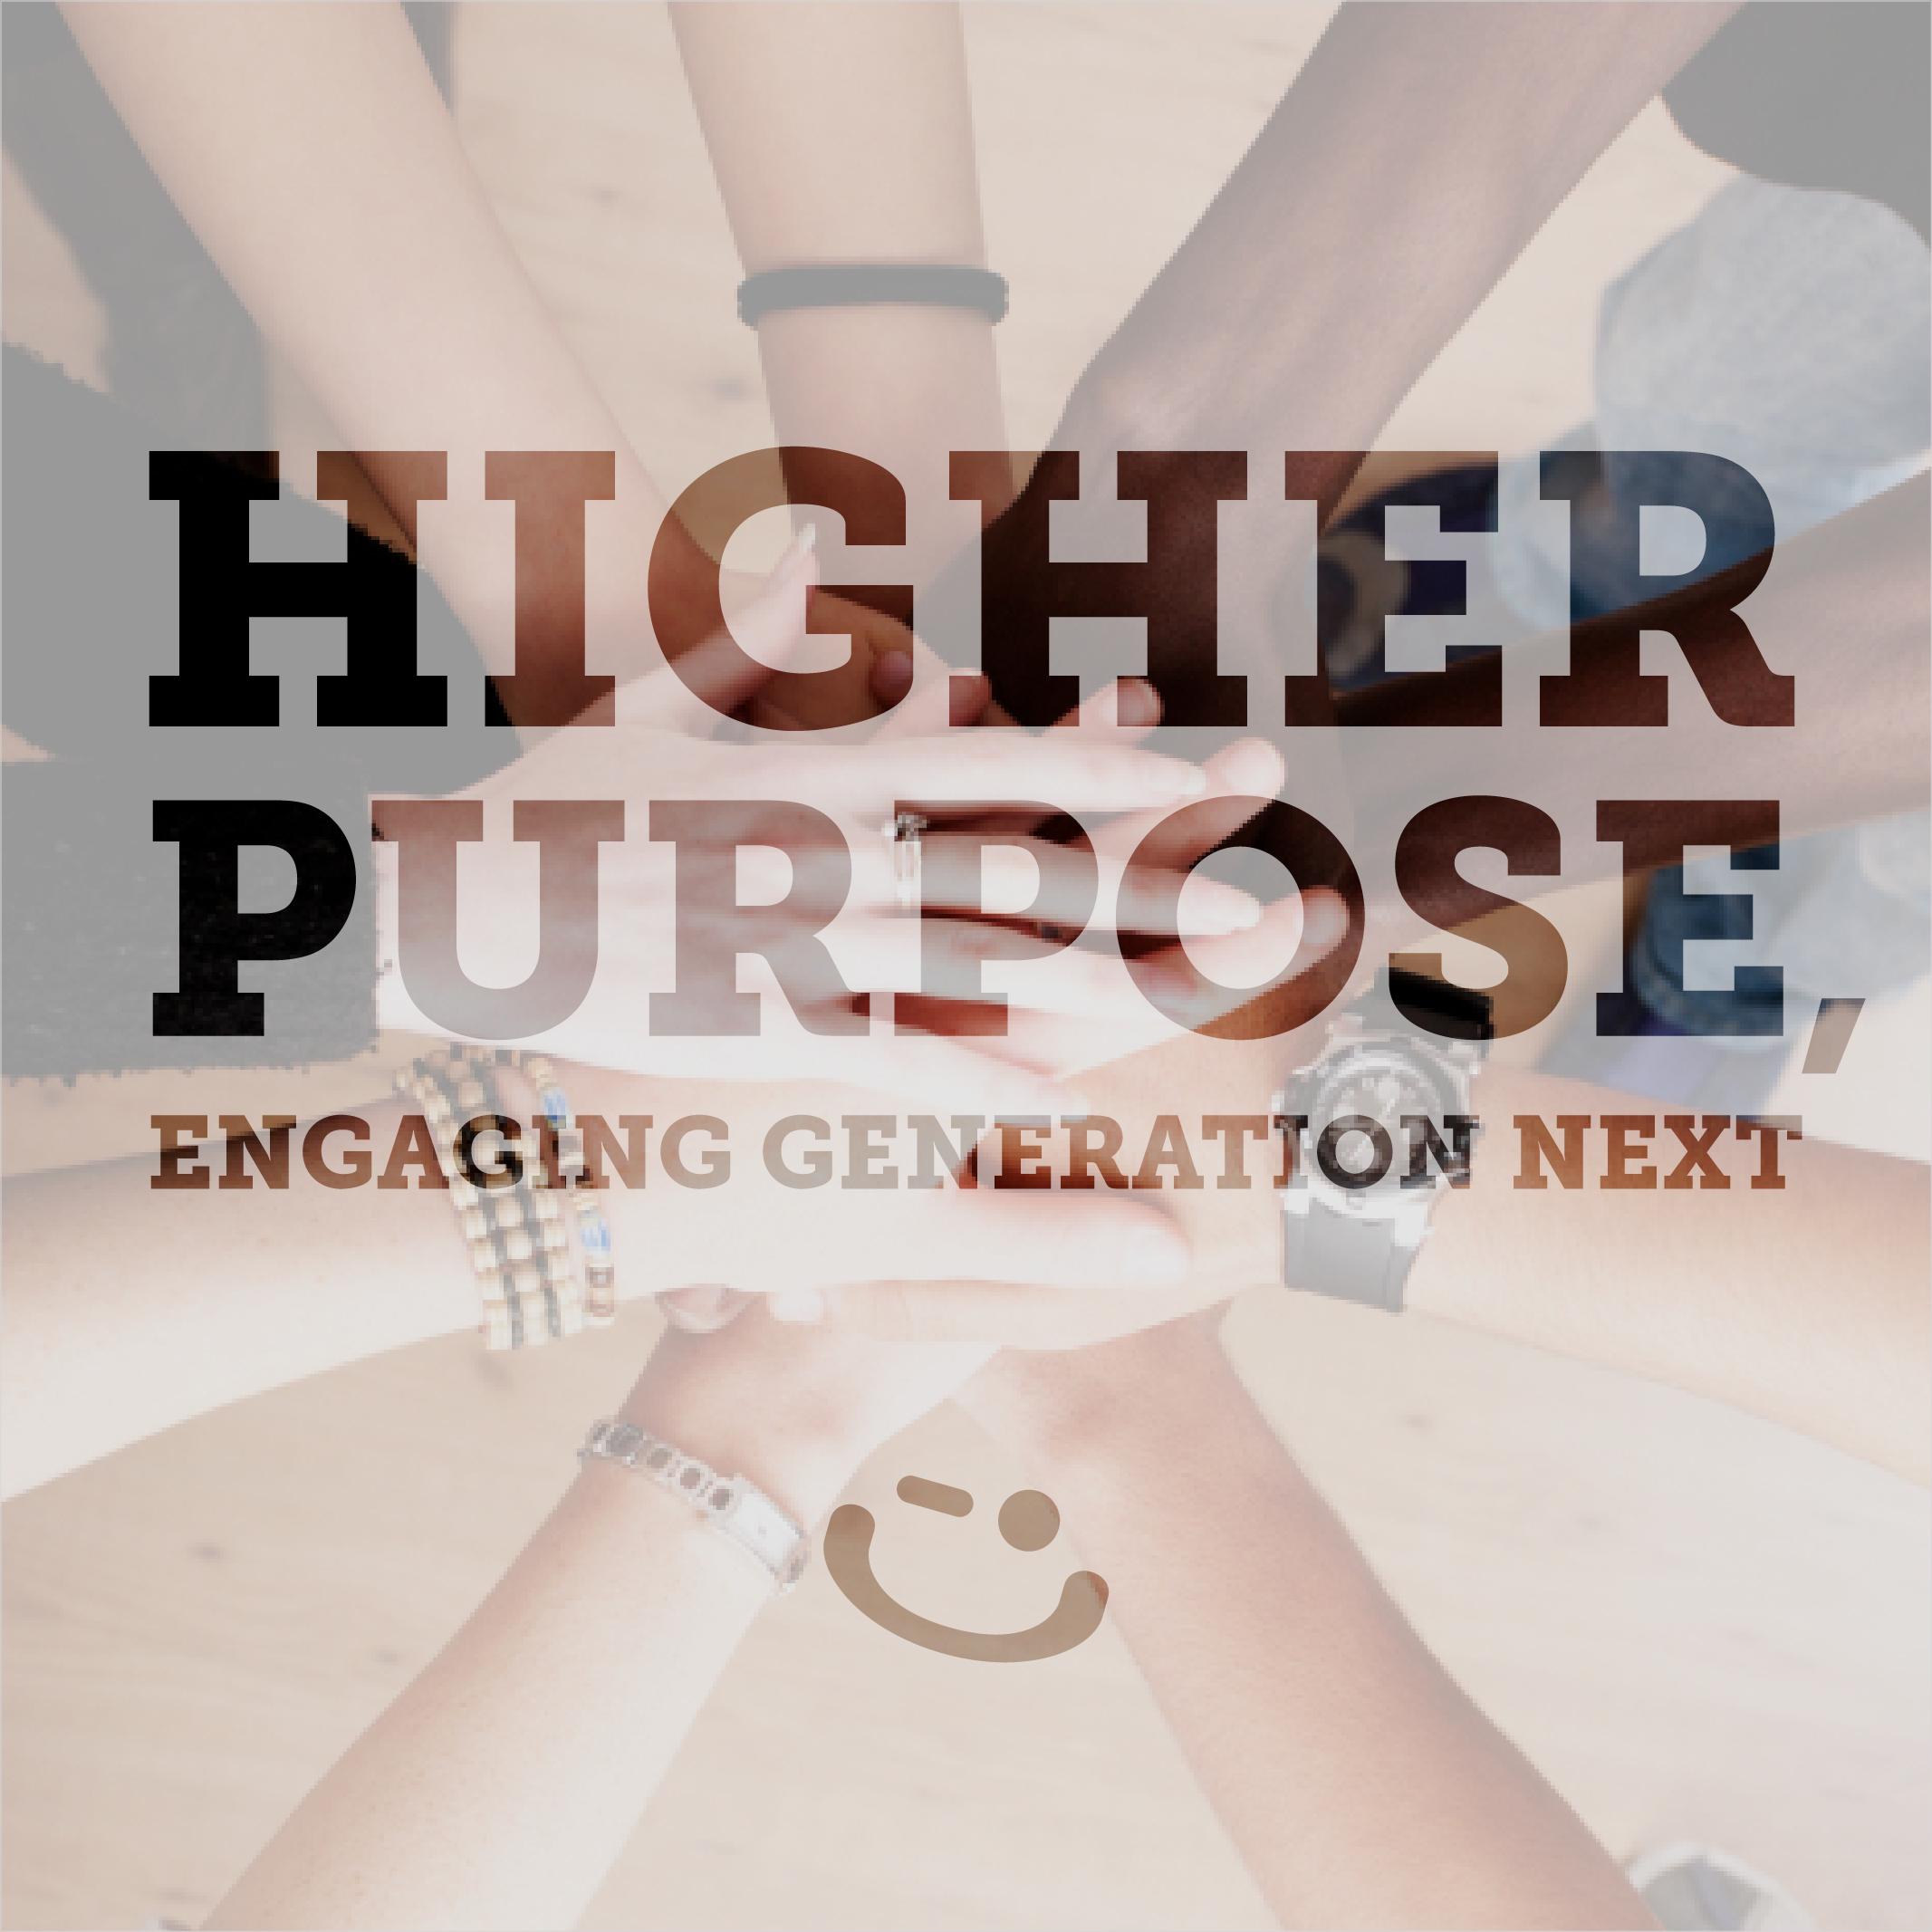 culturetip-engaginggenerationnext-02.png